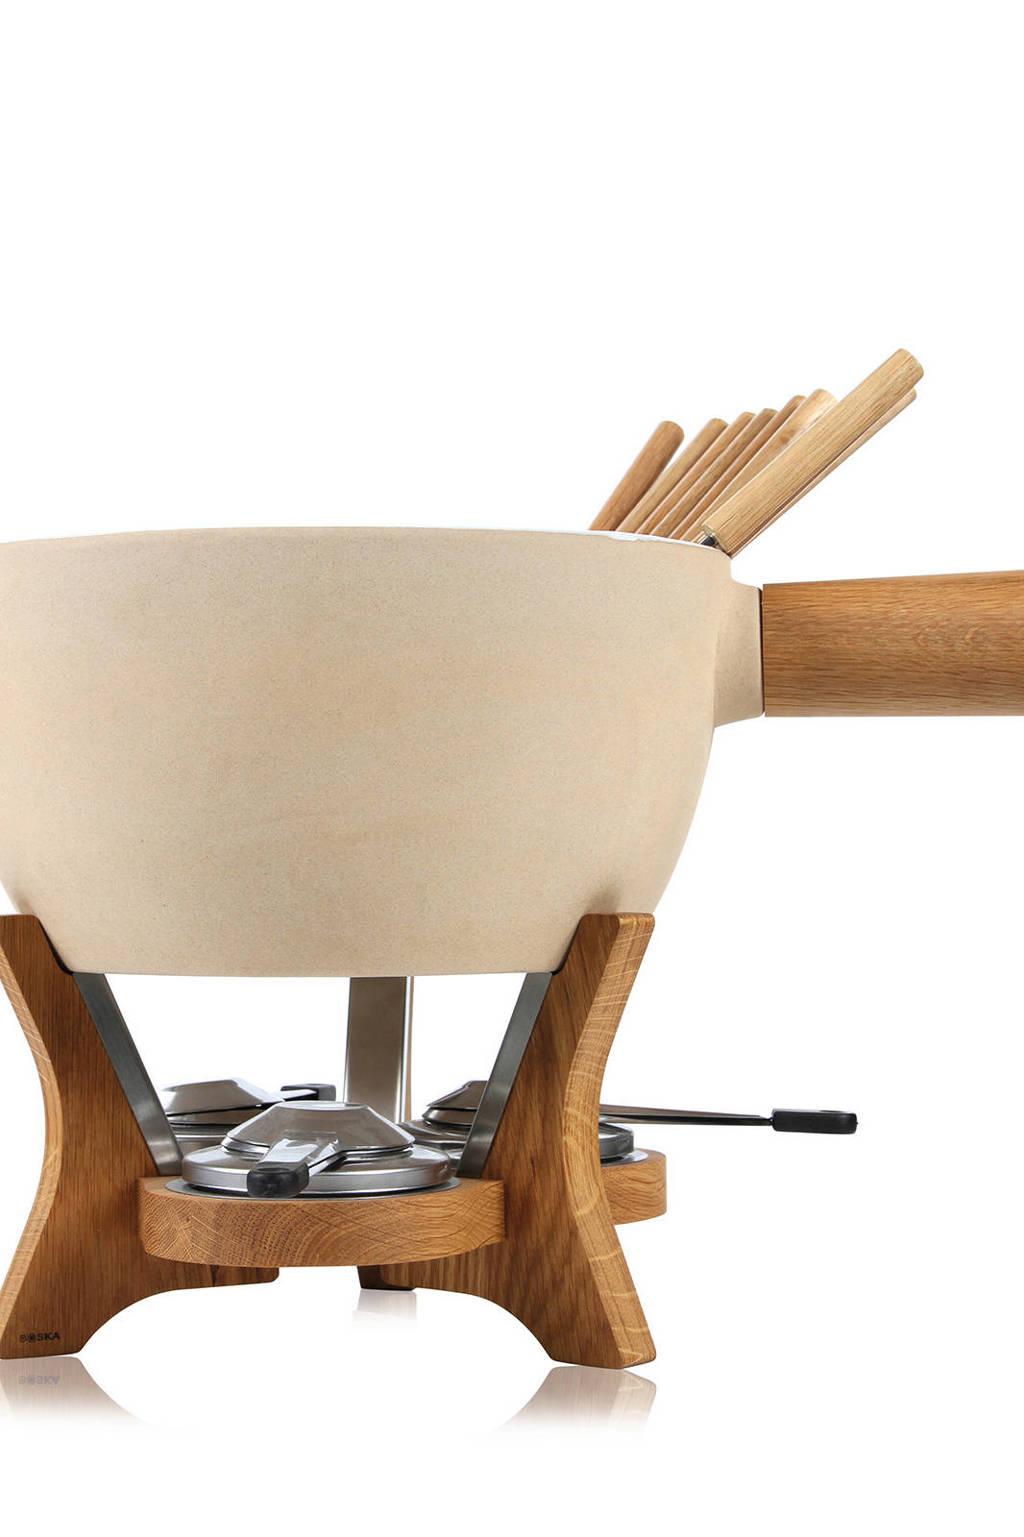 Boska Holland Cheesewares party fondue Mr. Big, Ecru